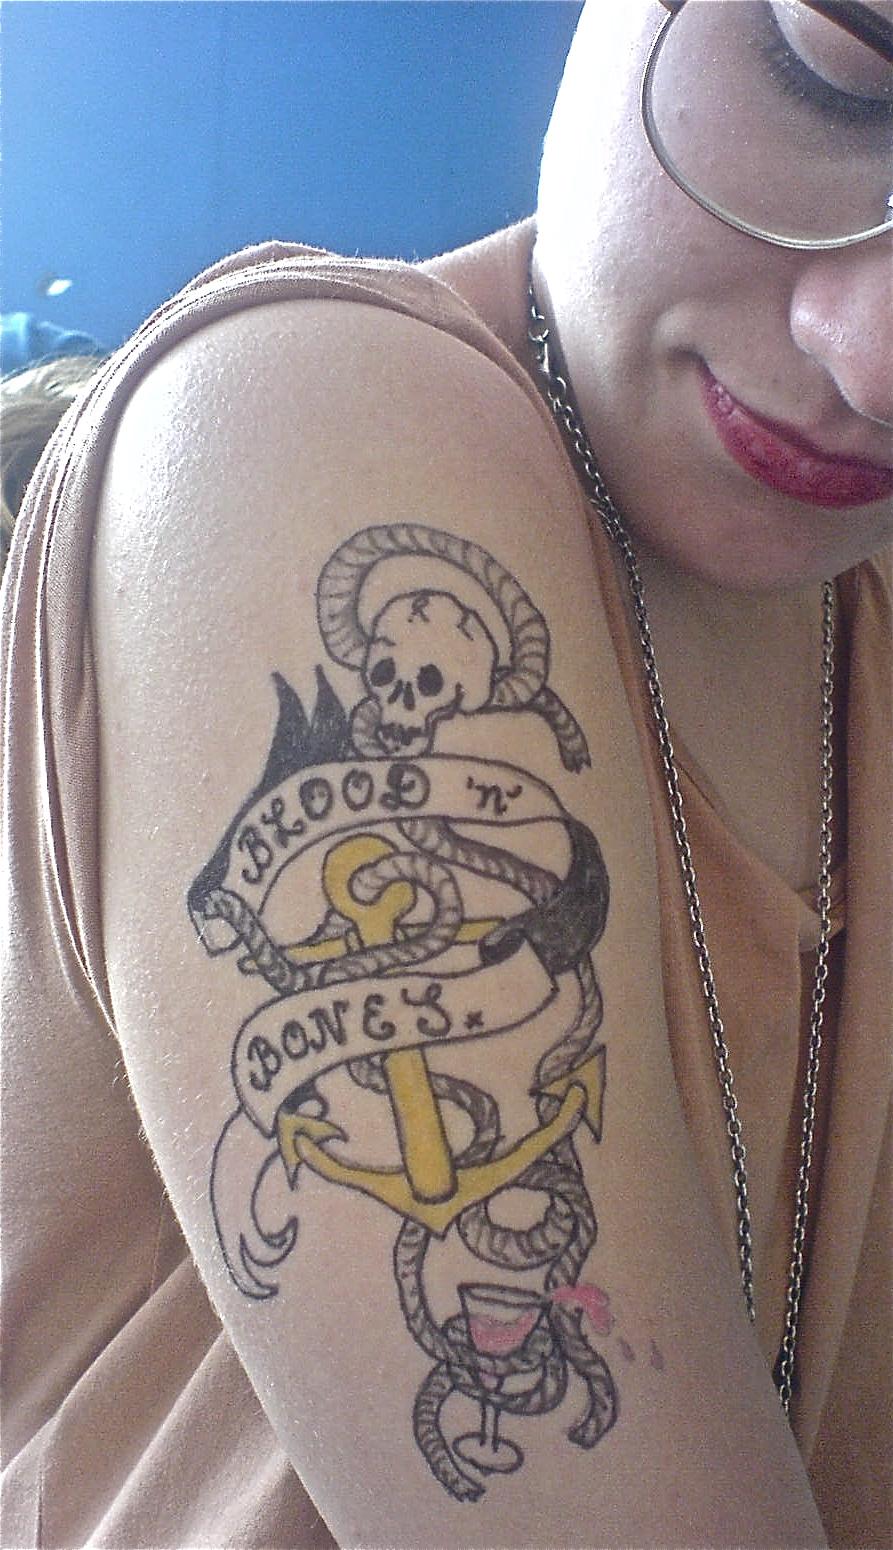 Tattoo buttocks - güzel ve kaba